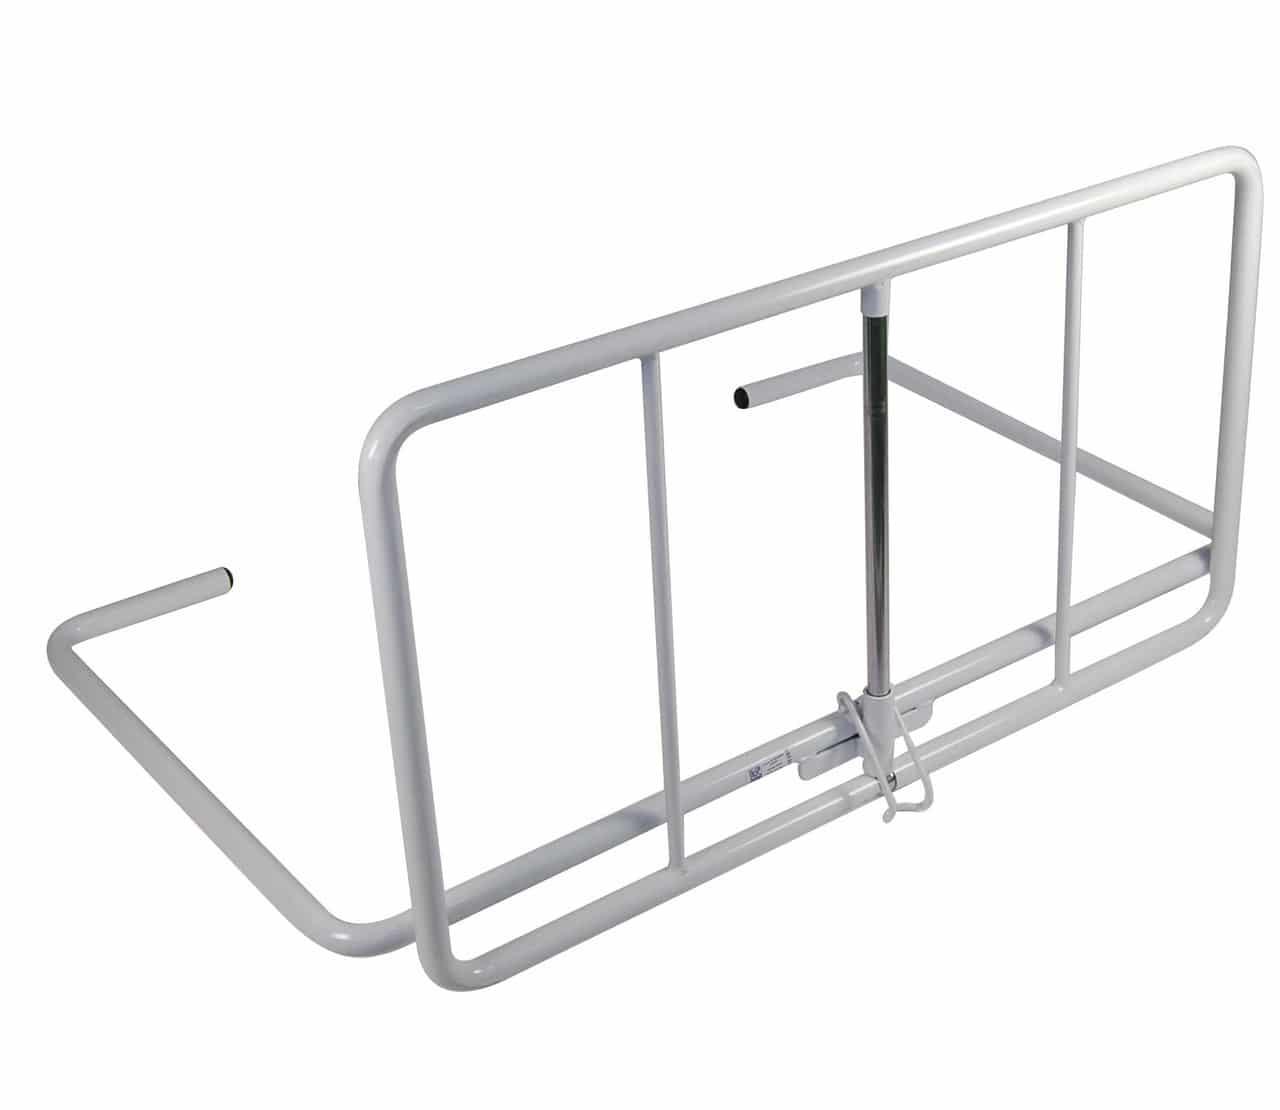 Dropside Bed Rail